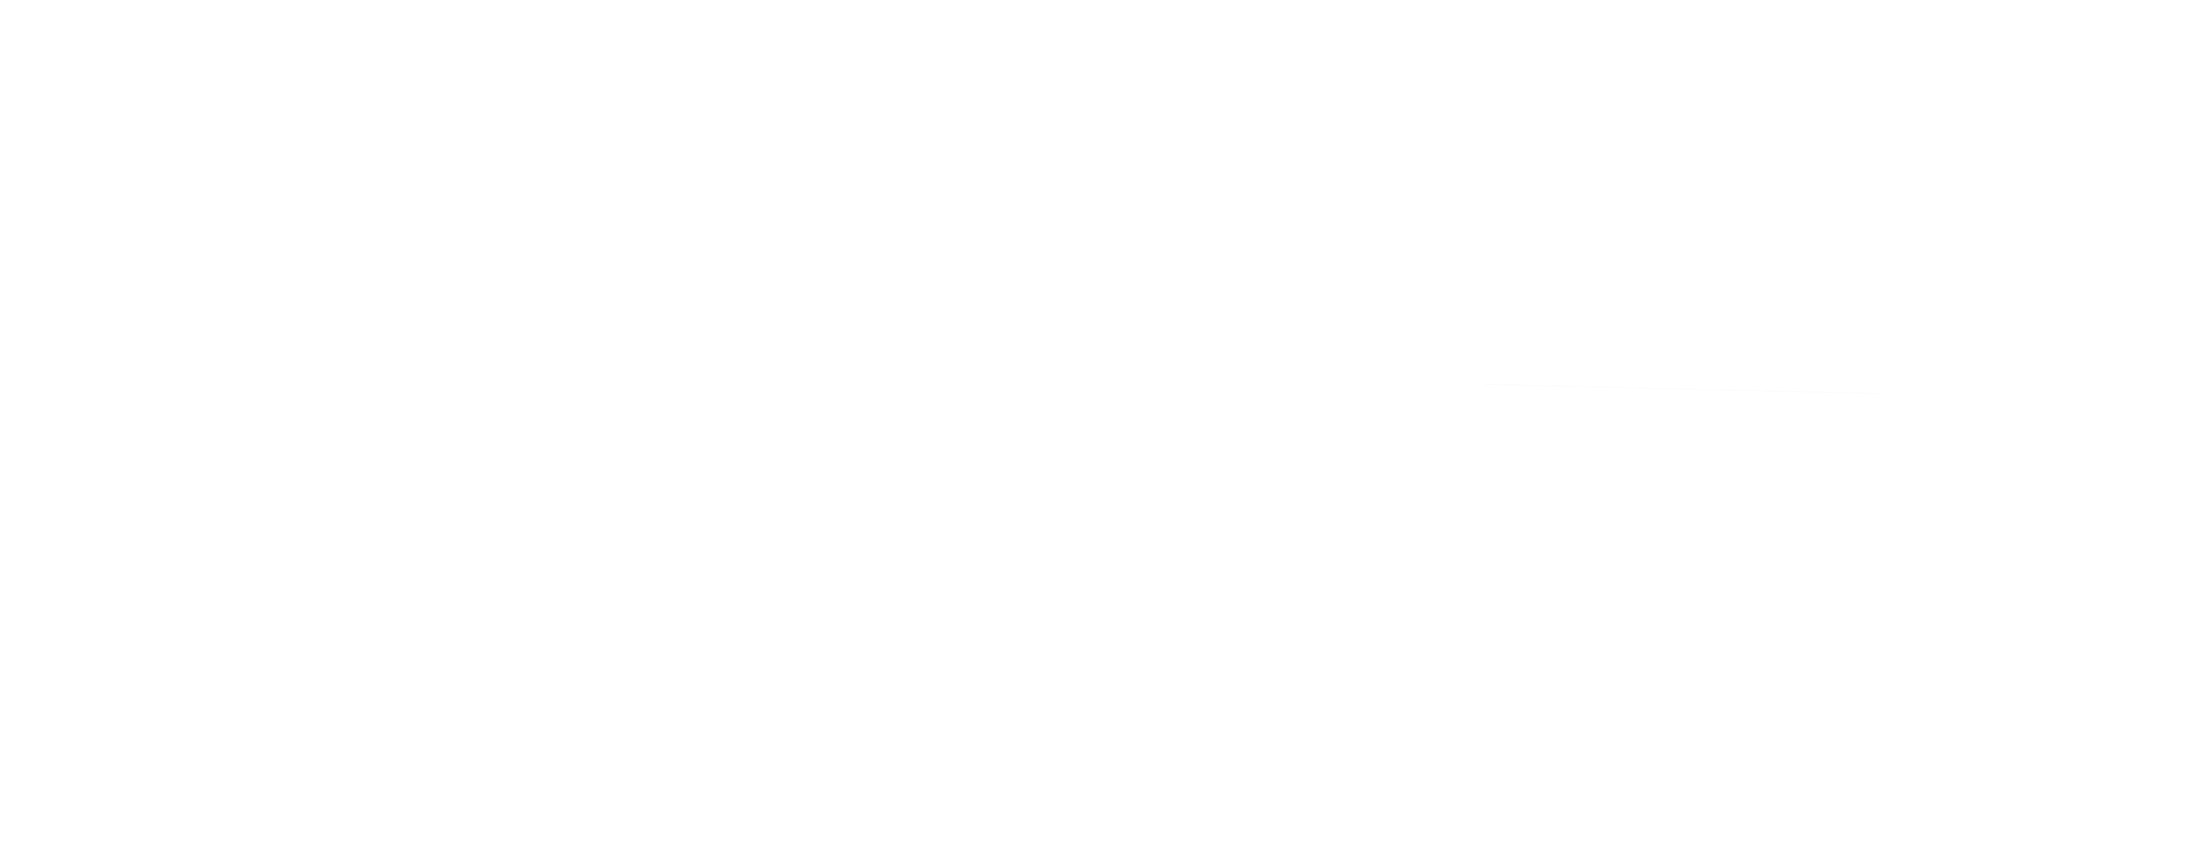 COMBO blueprint